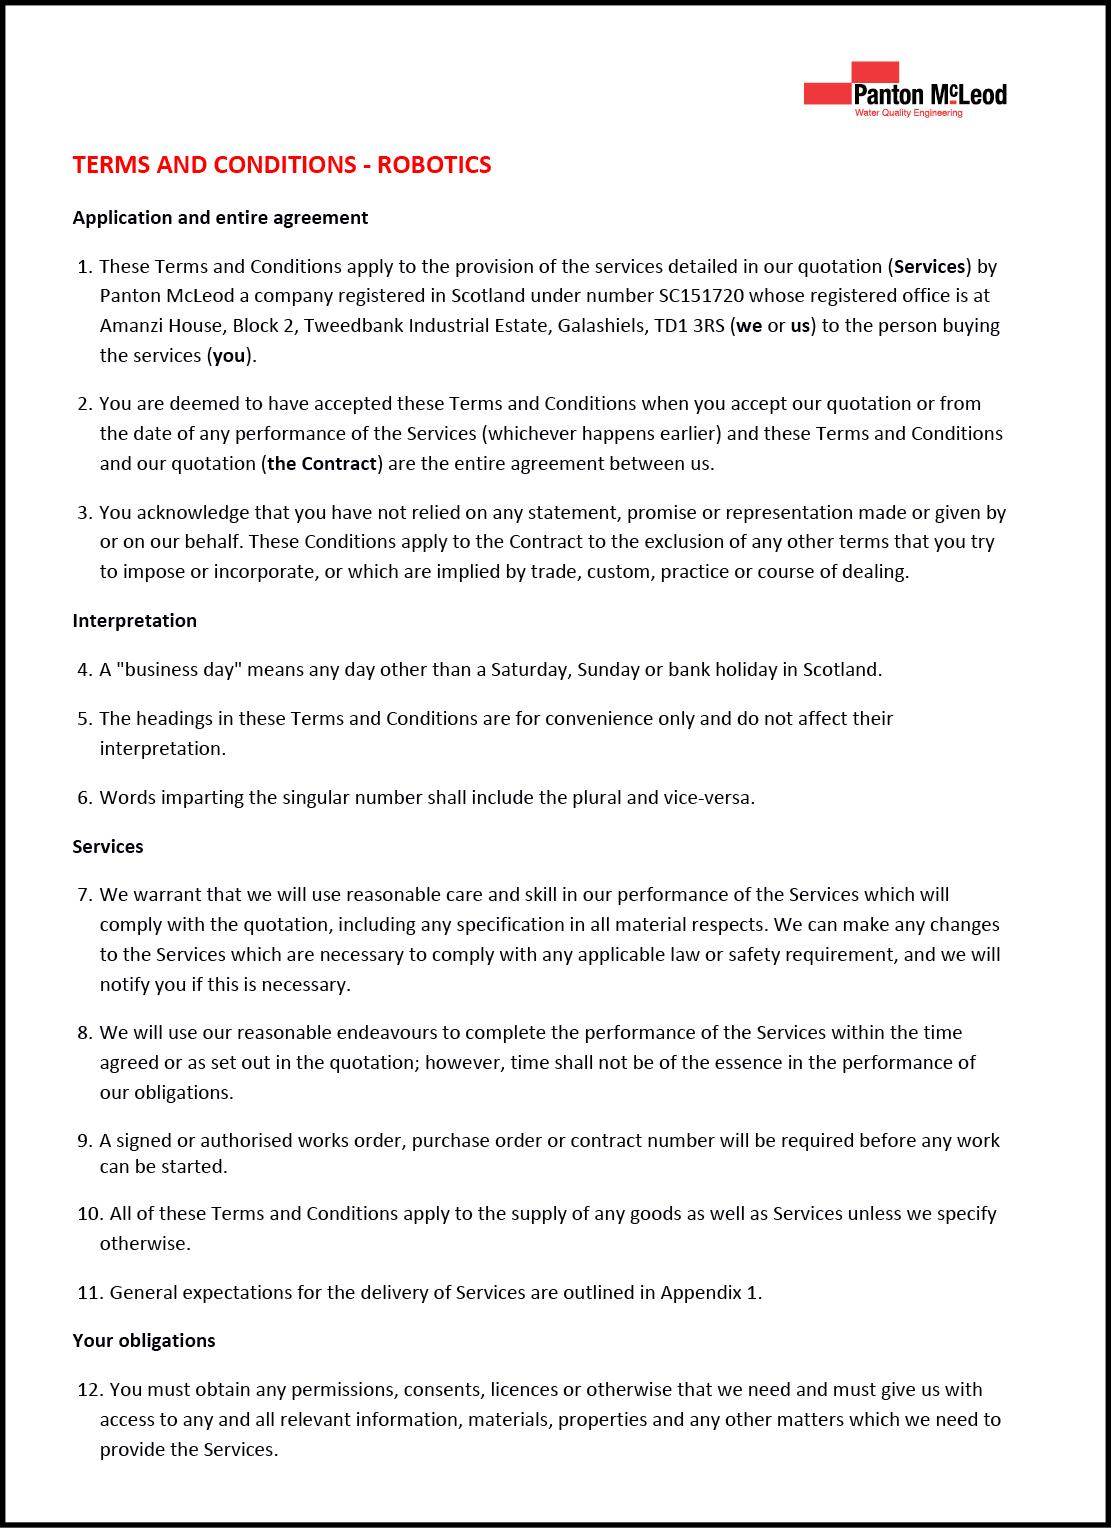 Robotics Terms & Conditions